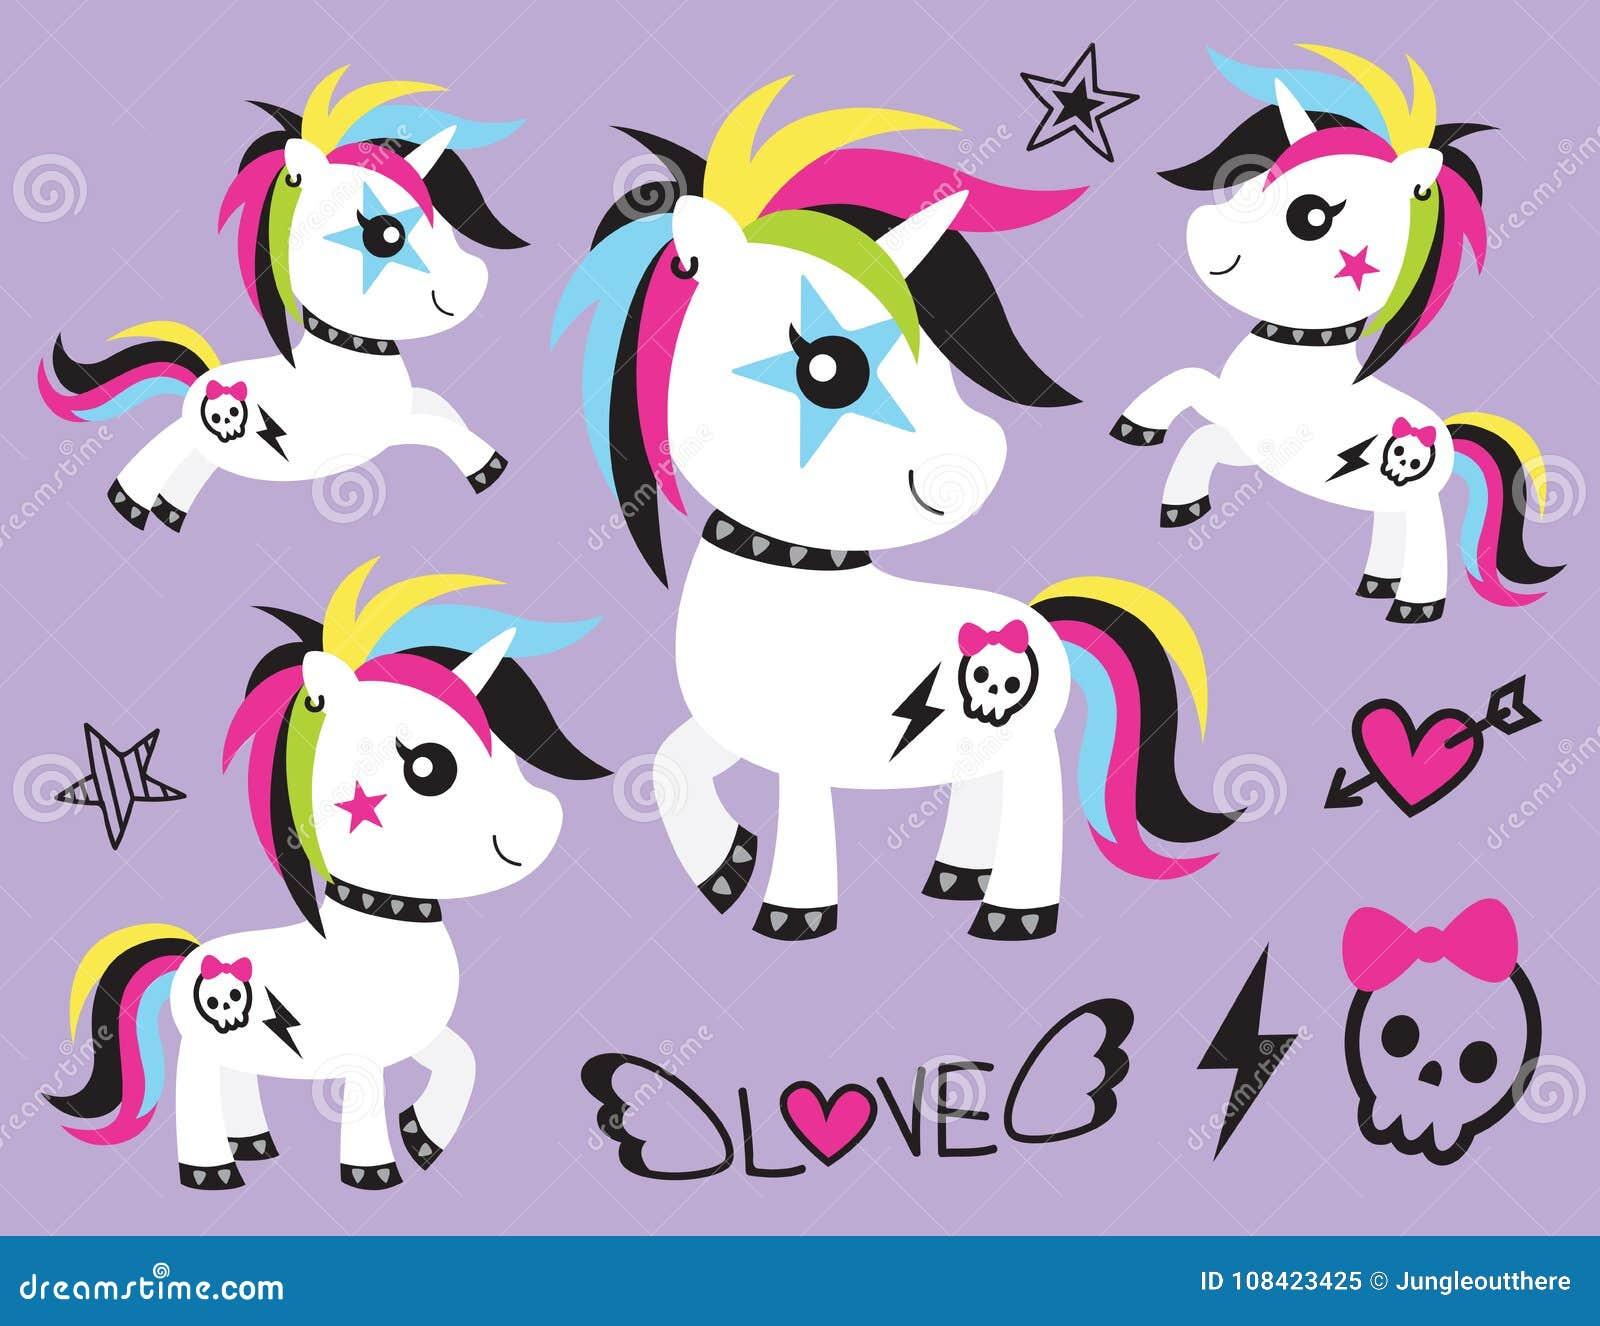 Unicorn Rocker Vector Illustration punk